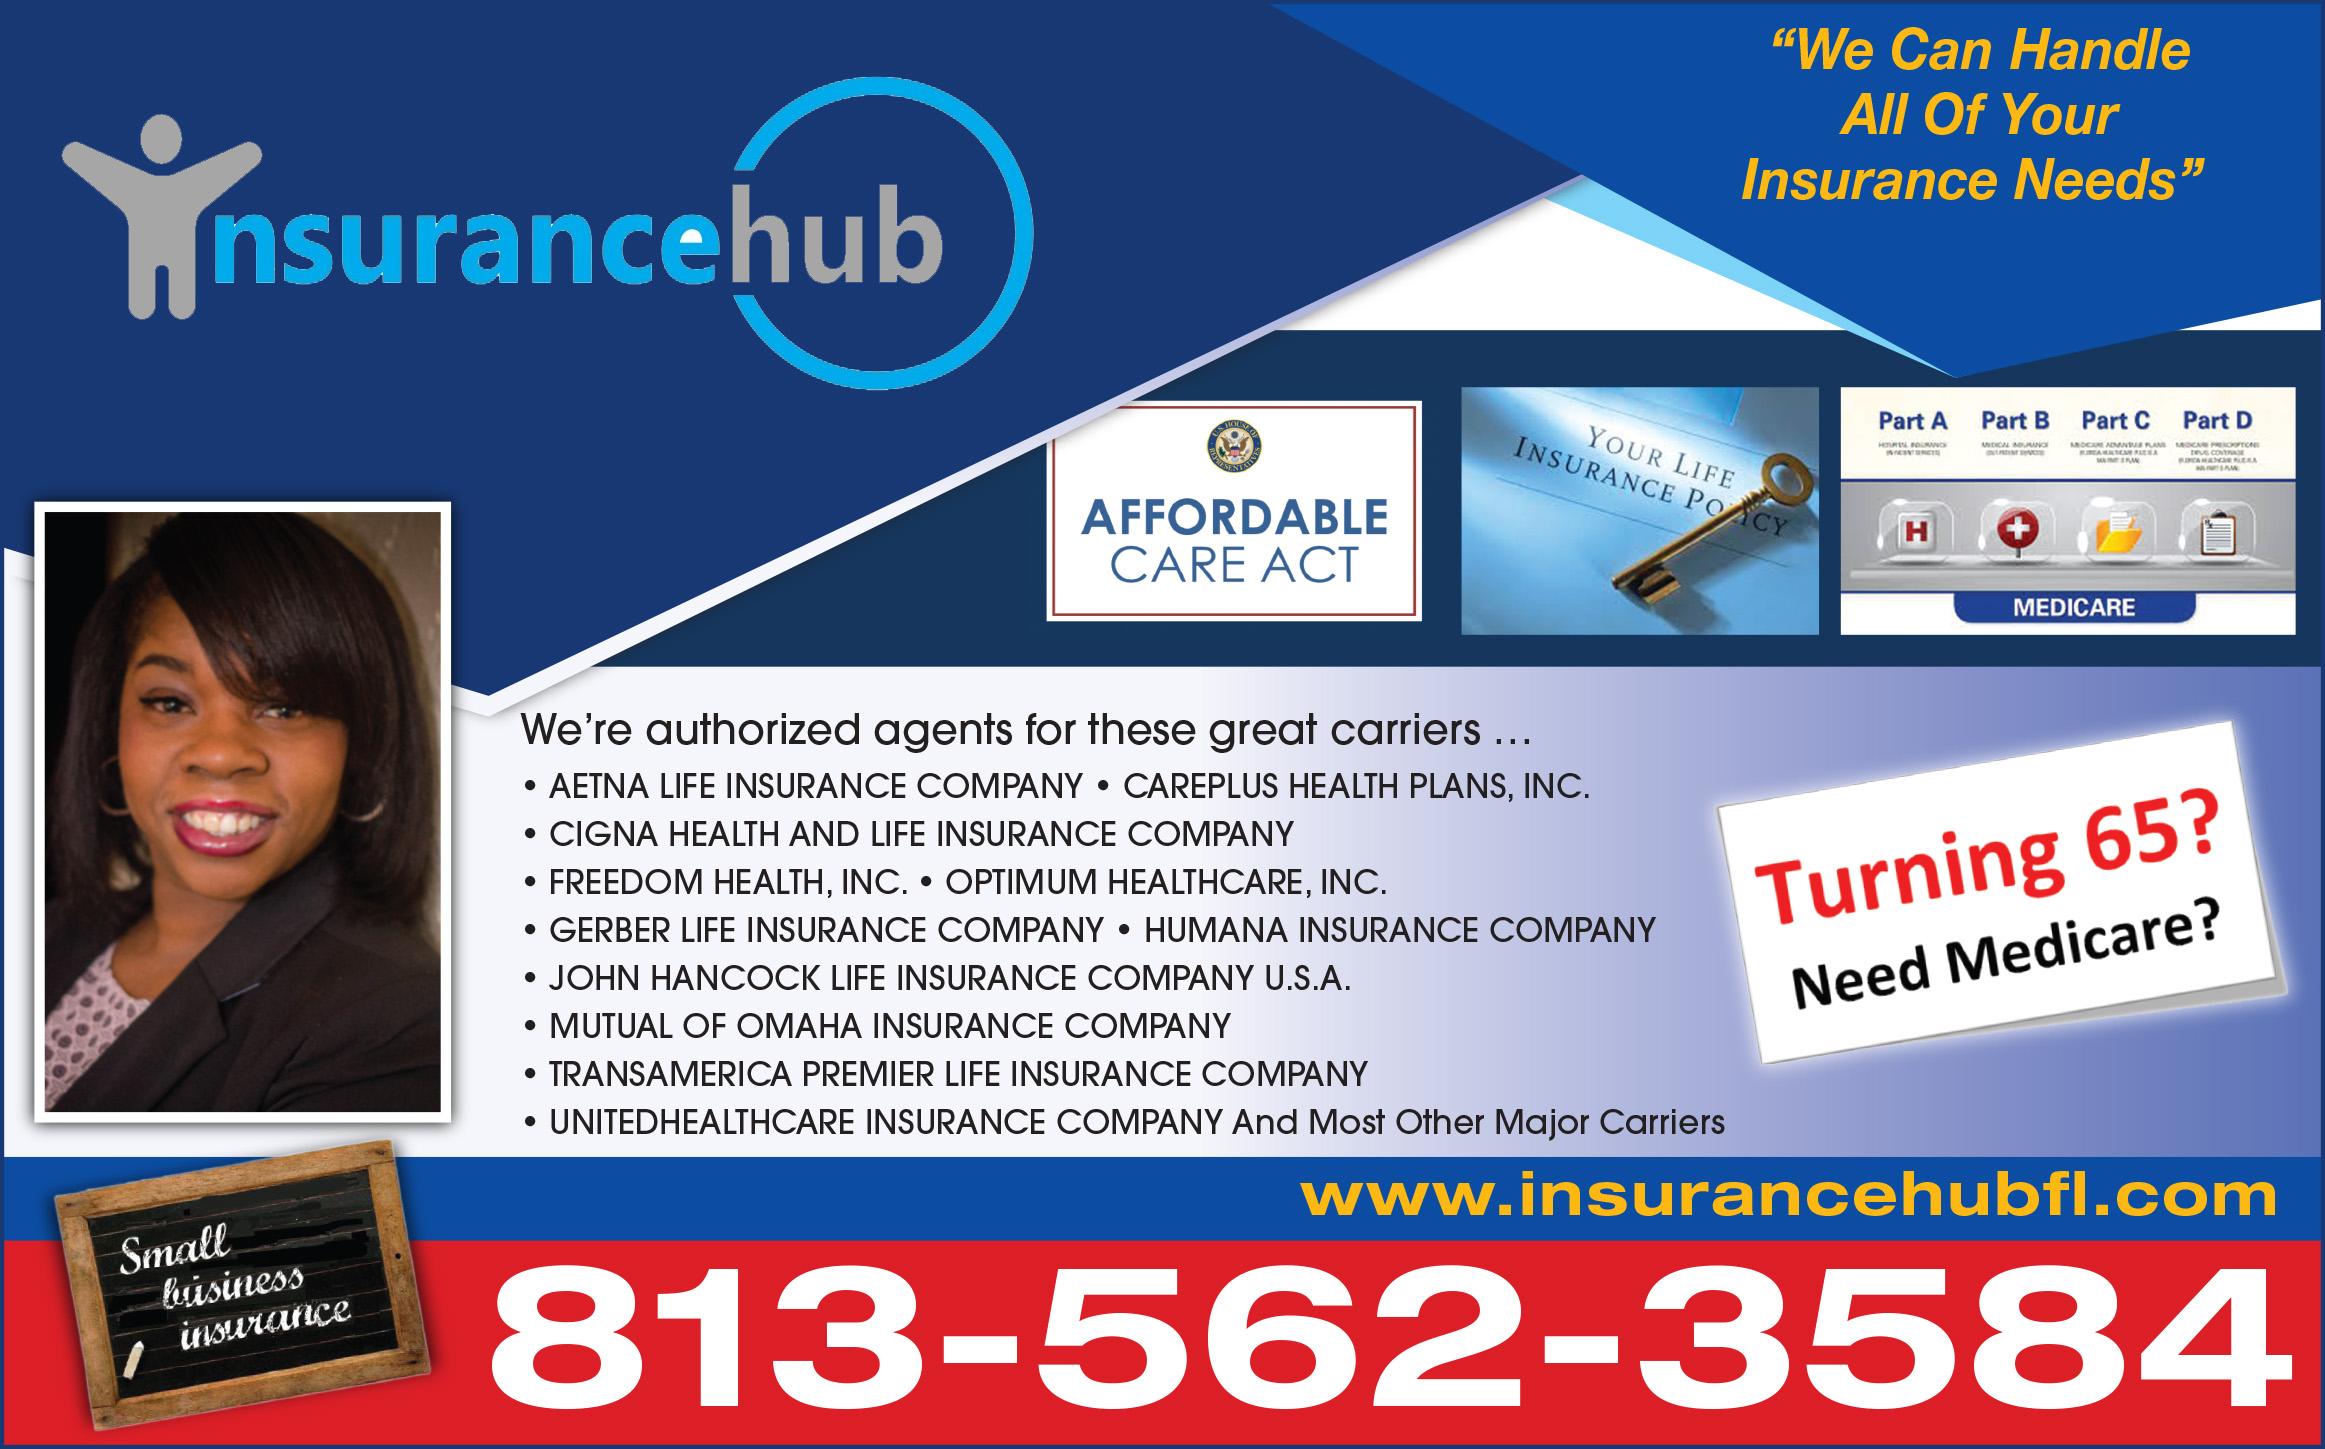 The Insurance Hub